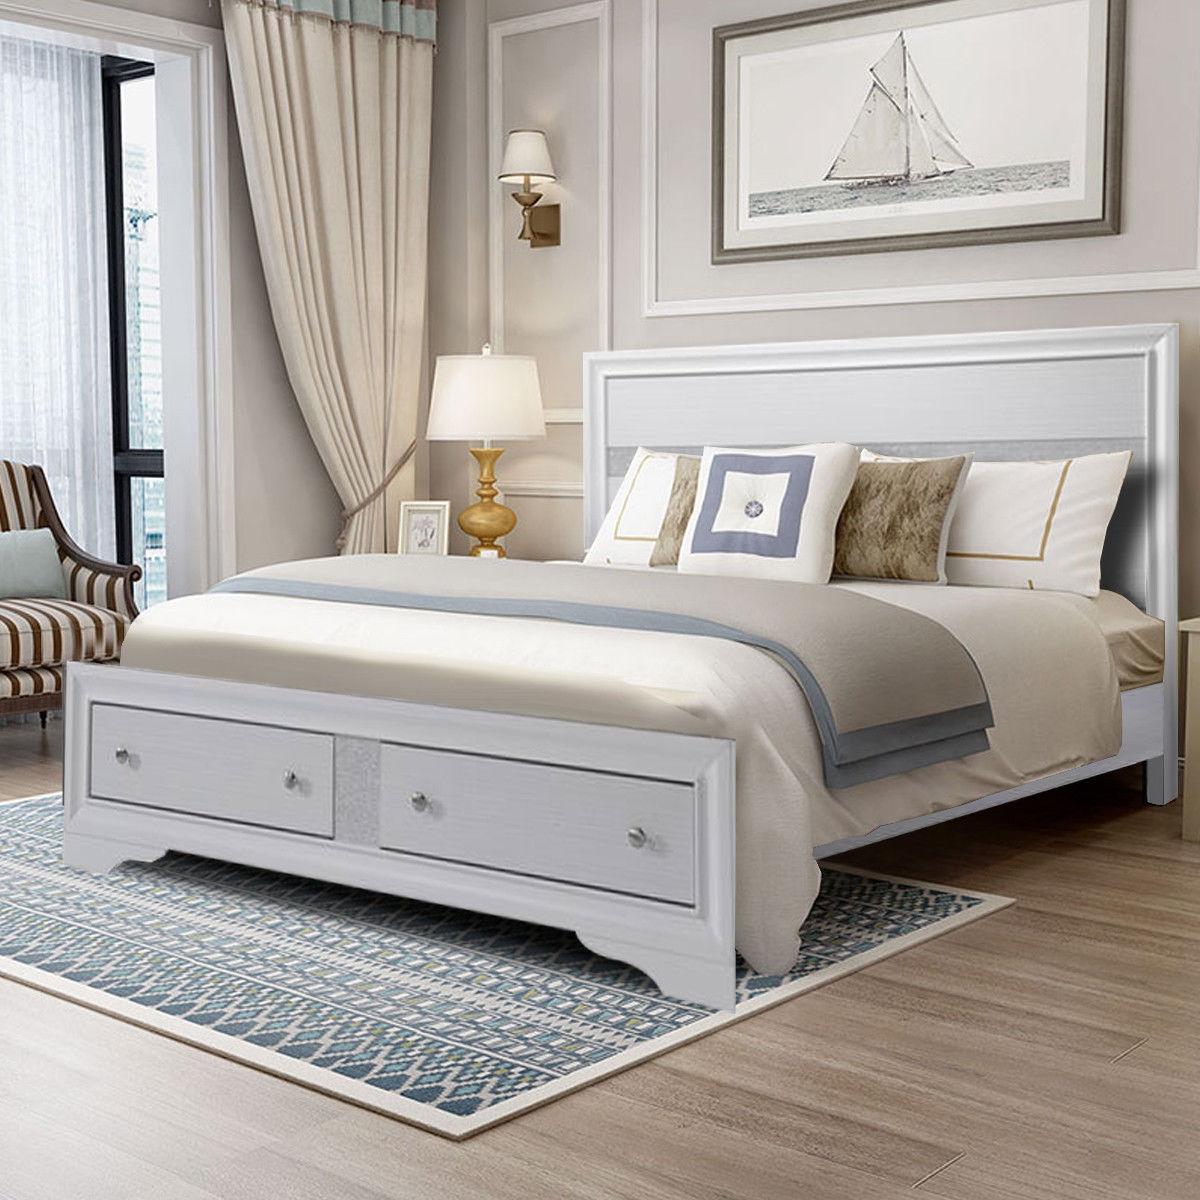 King Size Bed Frame Platform Wood Slats Tall Headboard Drawer Home Furniture -King Size